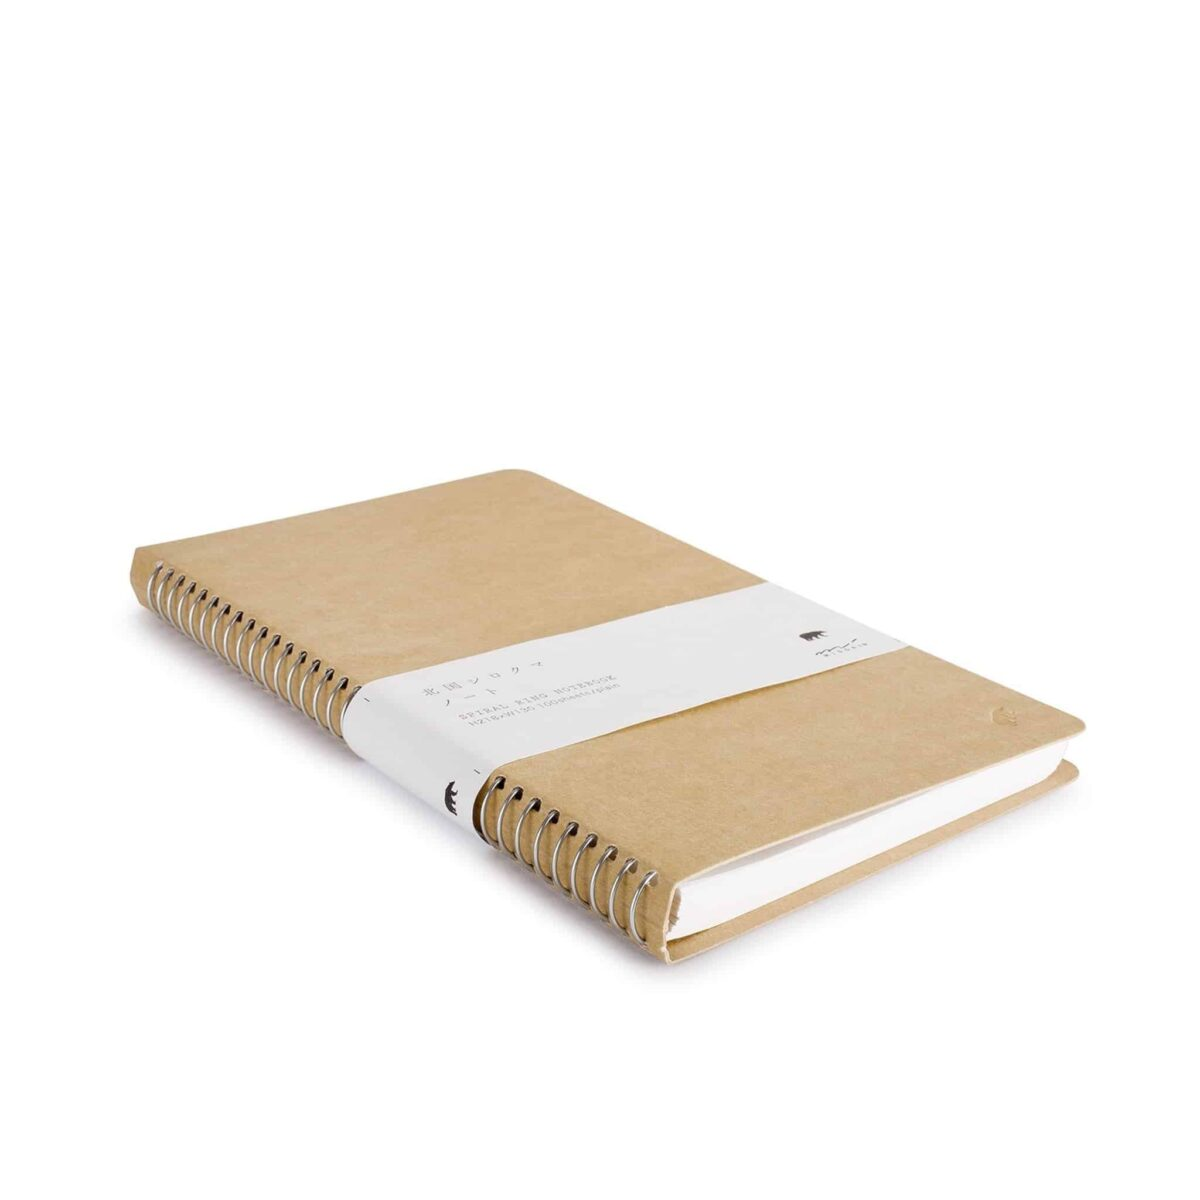 Midori_Notebook_A5_001